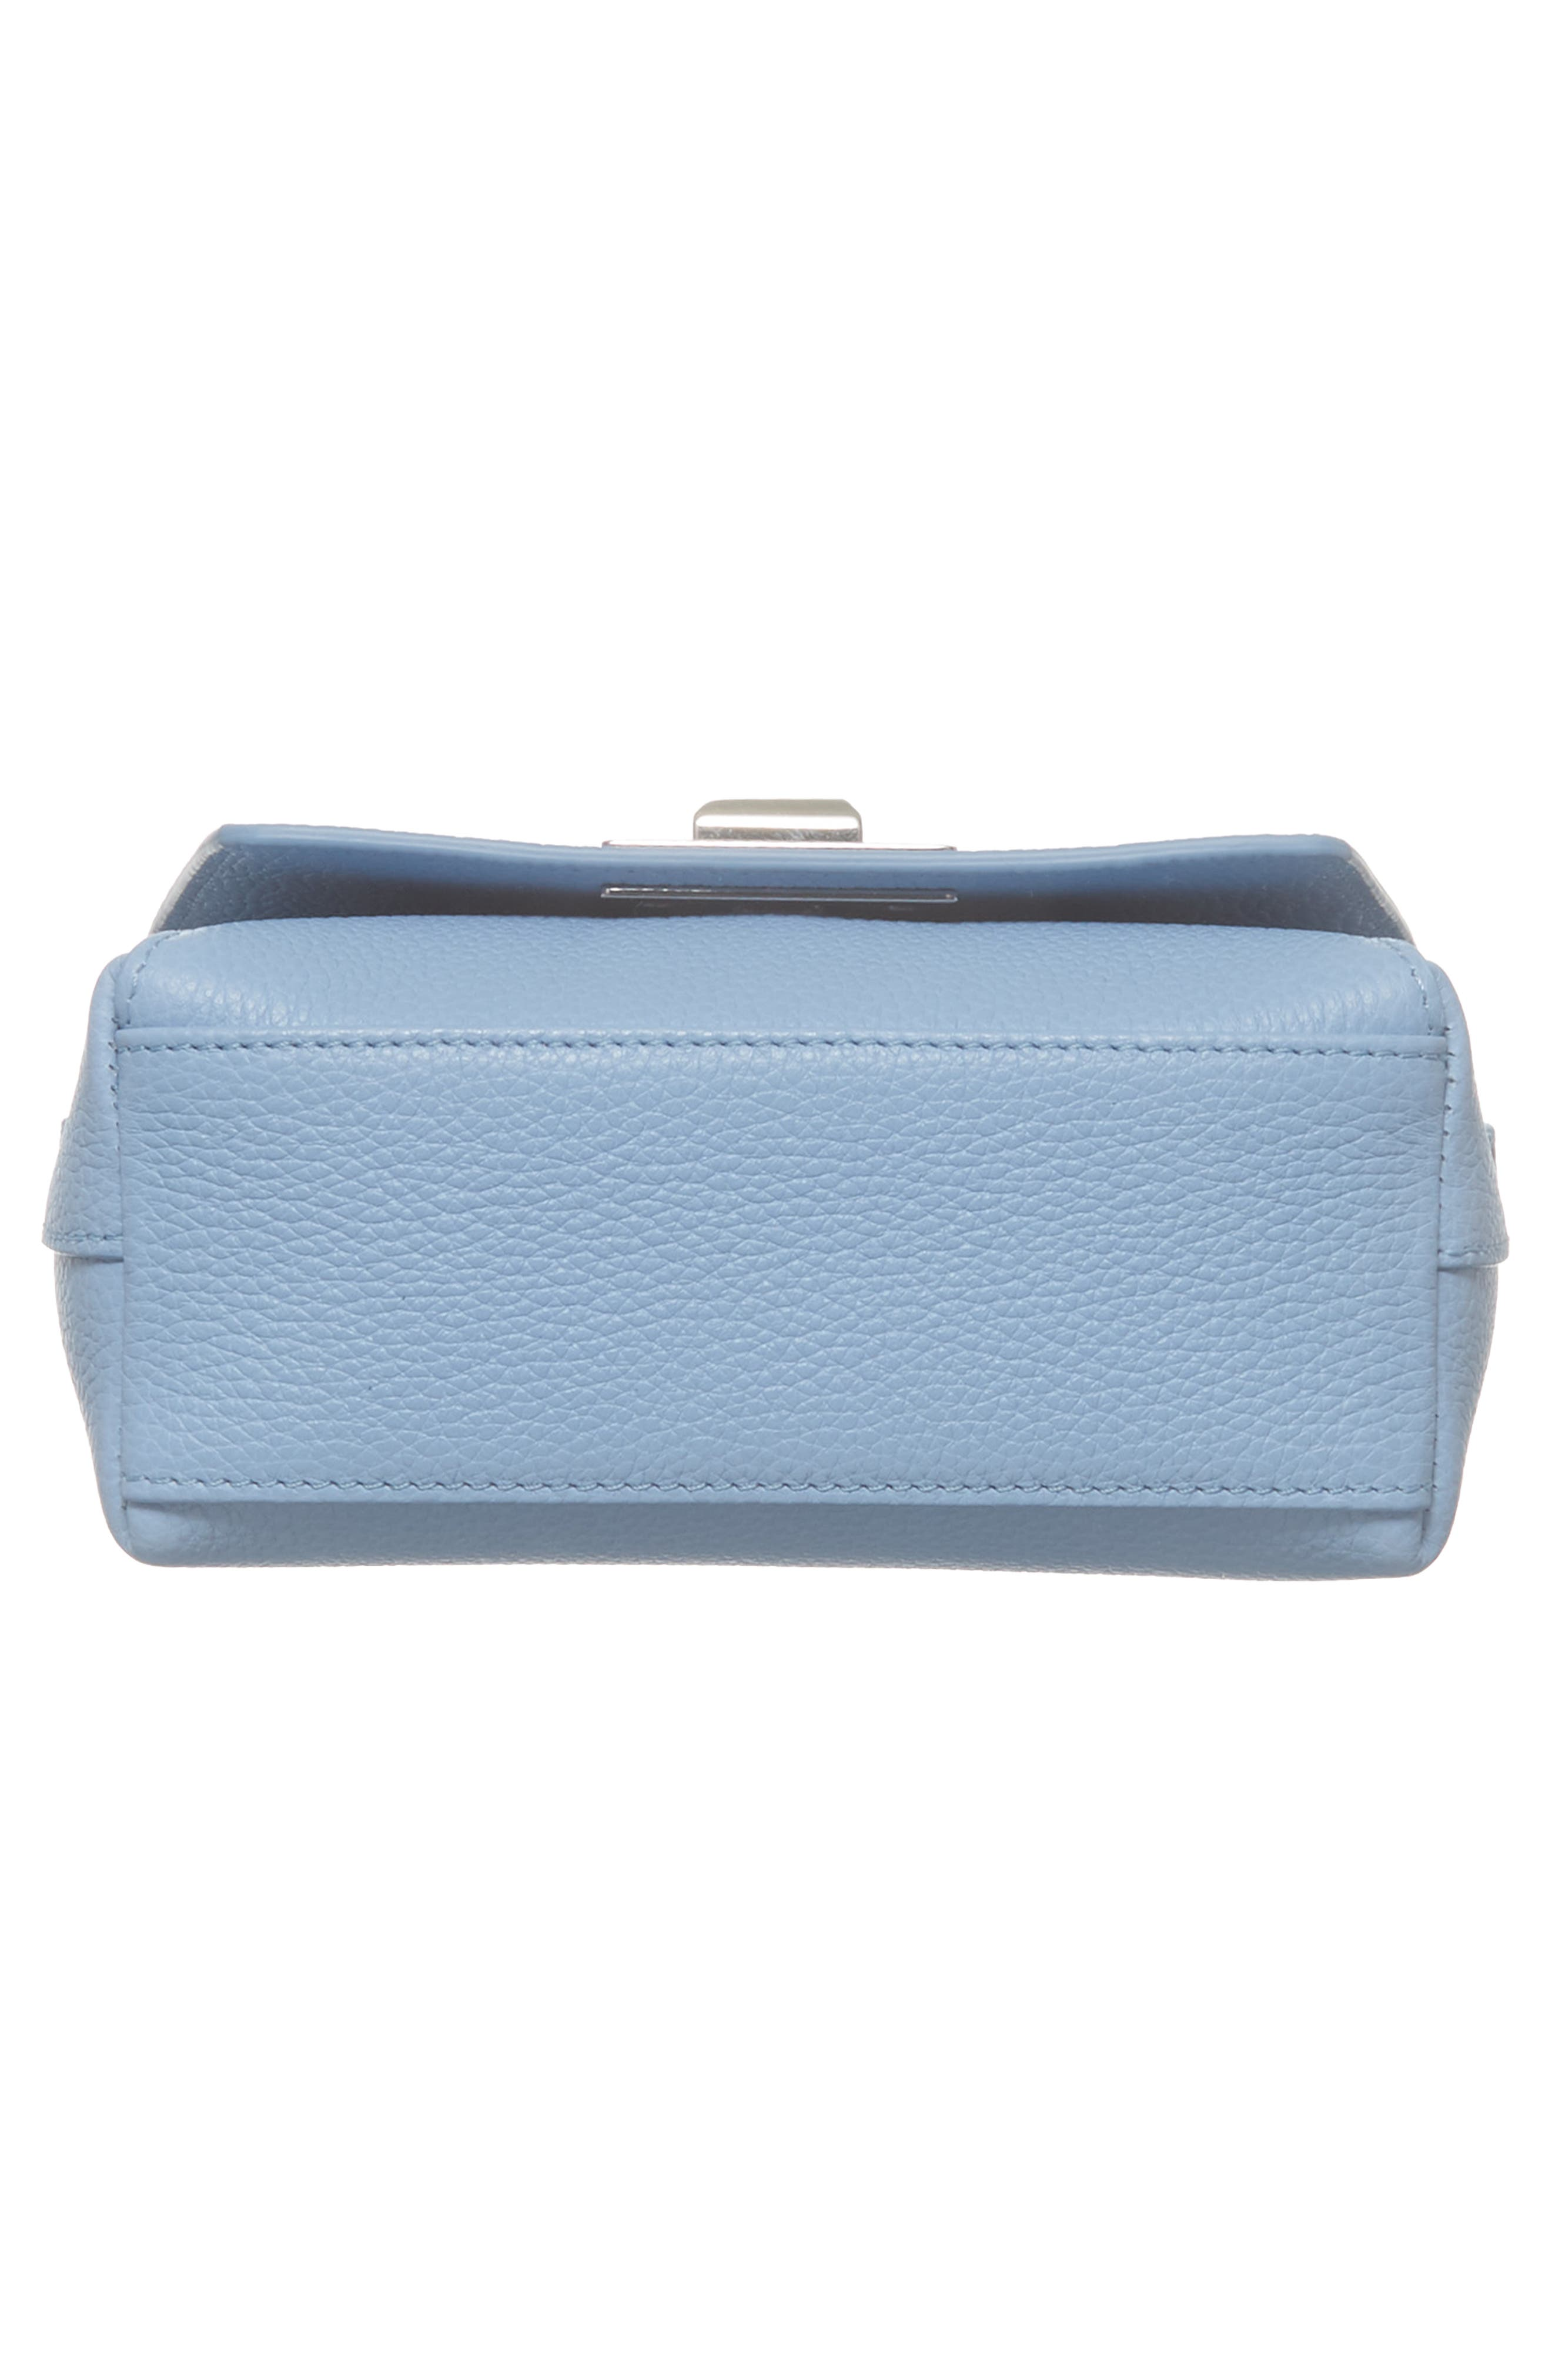 Little Anouk Calfskin Crossbody Bag,                             Alternate thumbnail 7, color,                             POWDER BLUE